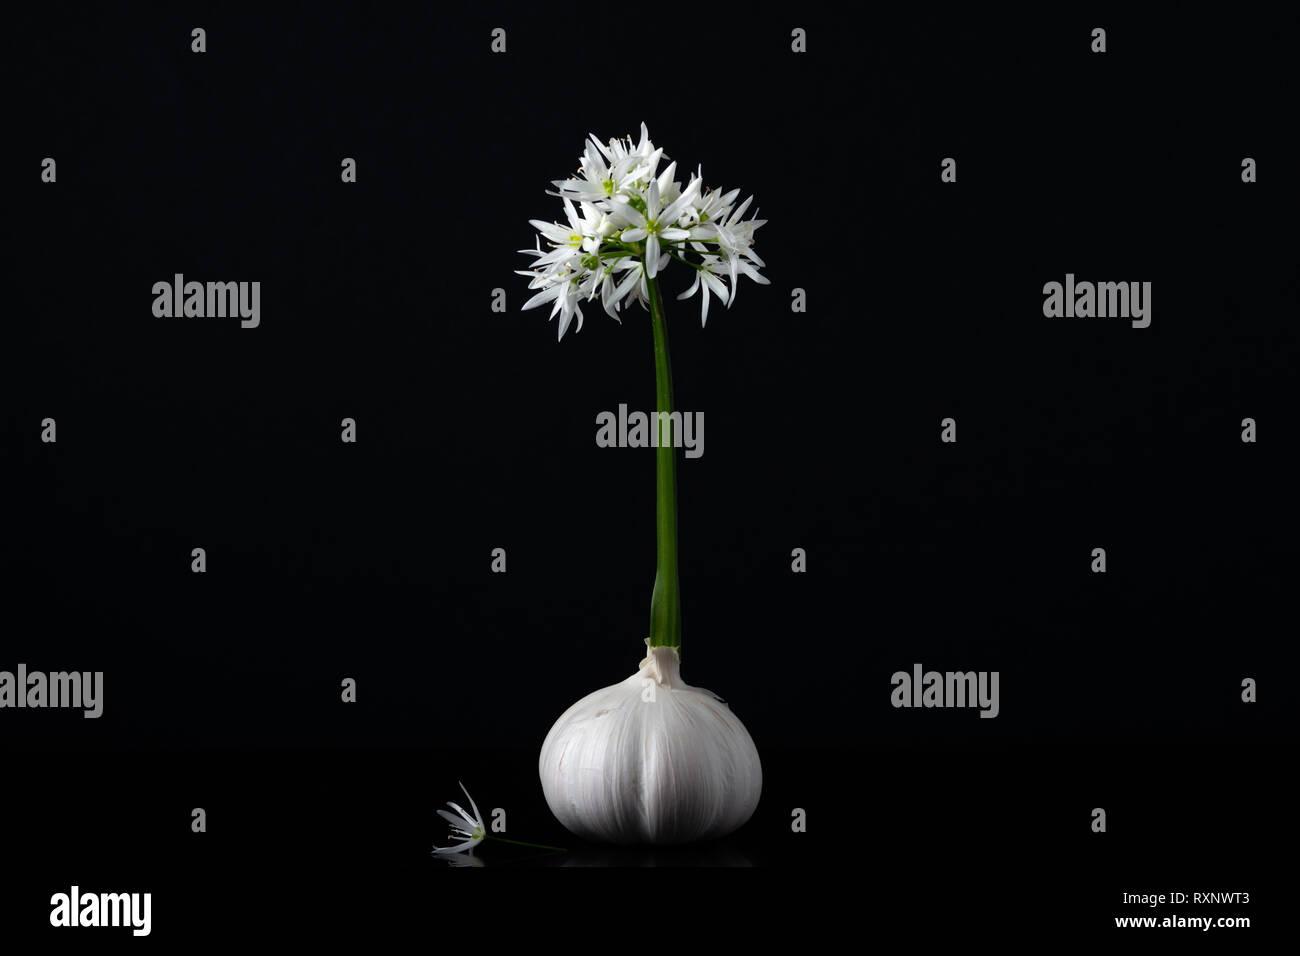 Wild garlic flower head (Allium Longicuspis ) and garlic bulb (Allium Sativum) as a creative composition on black background - Stock Image